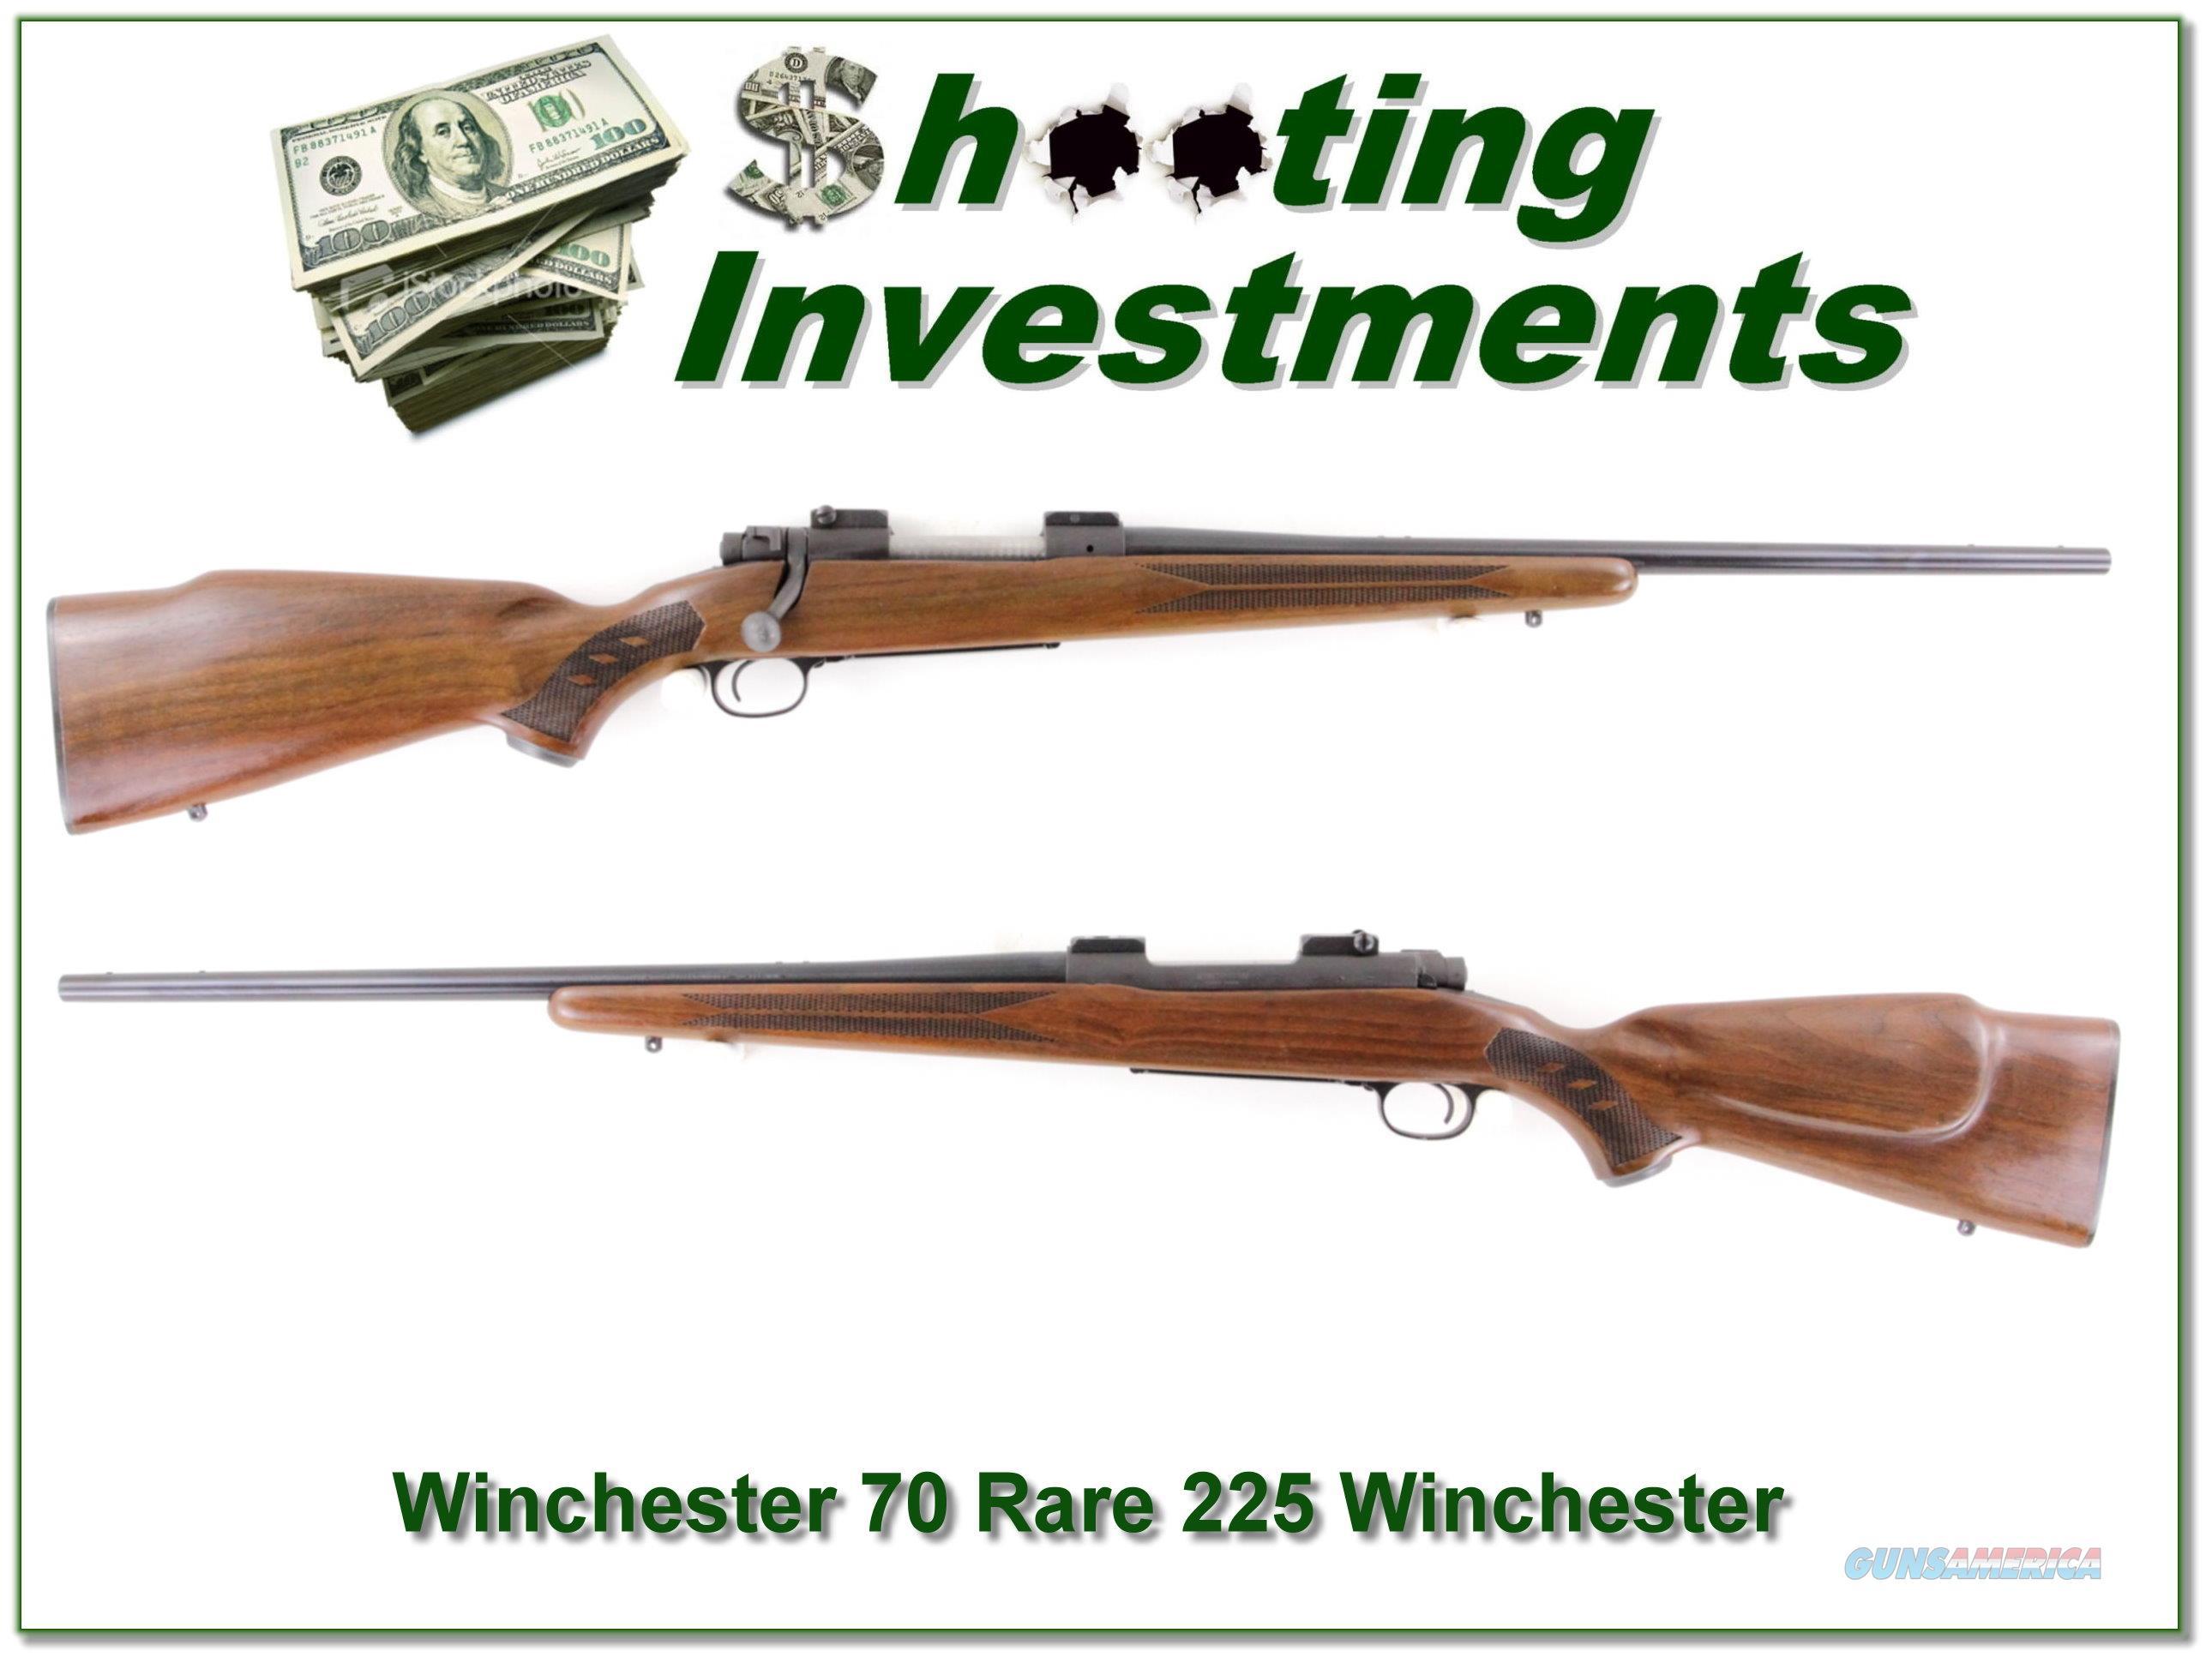 Winchester 70 rare 225 Winchester 1965  Guns > Rifles > Winchester Rifles - Modern Bolt/Auto/Single > Model 70 > Post-64